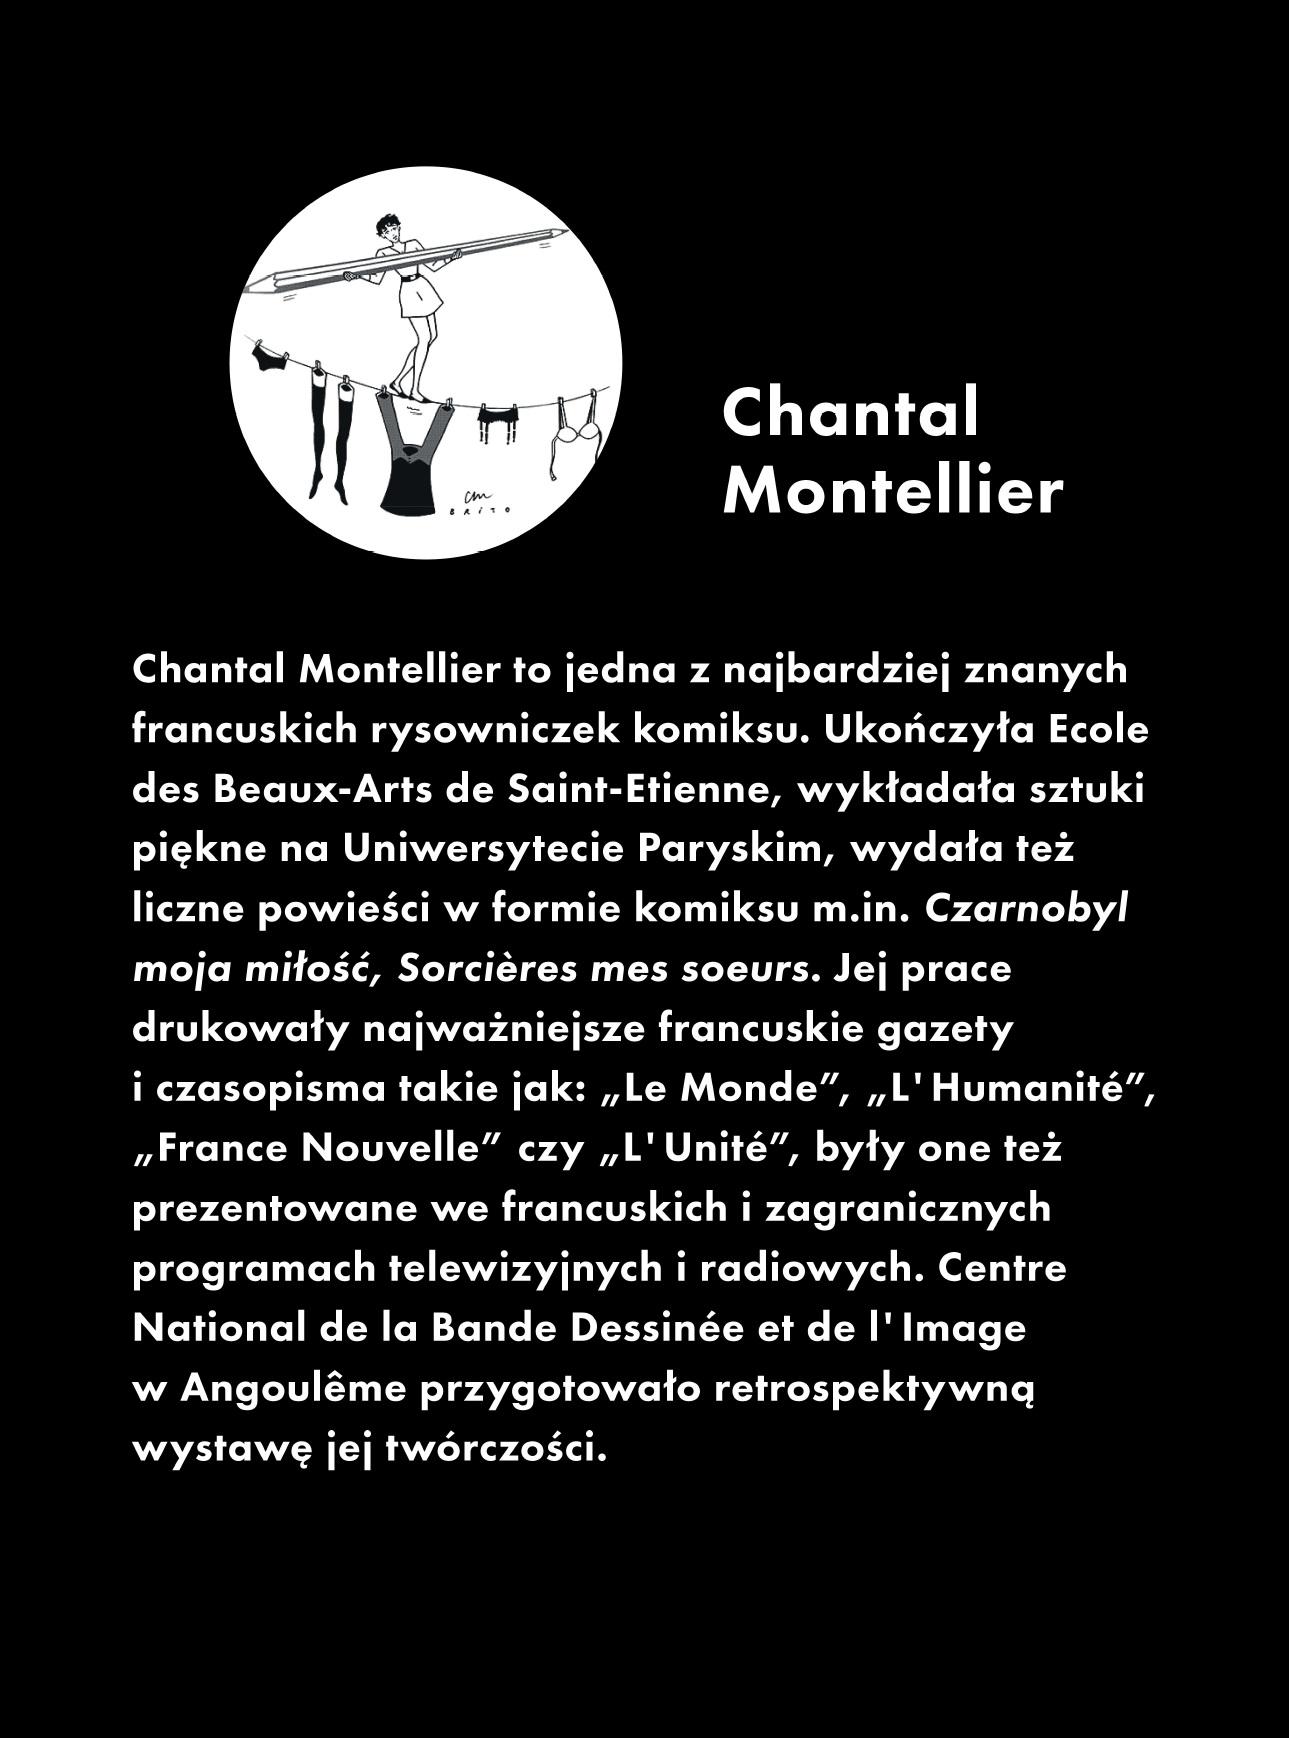 Chantall Montelier – biogram (źródło: materiały prasowe organizatora)